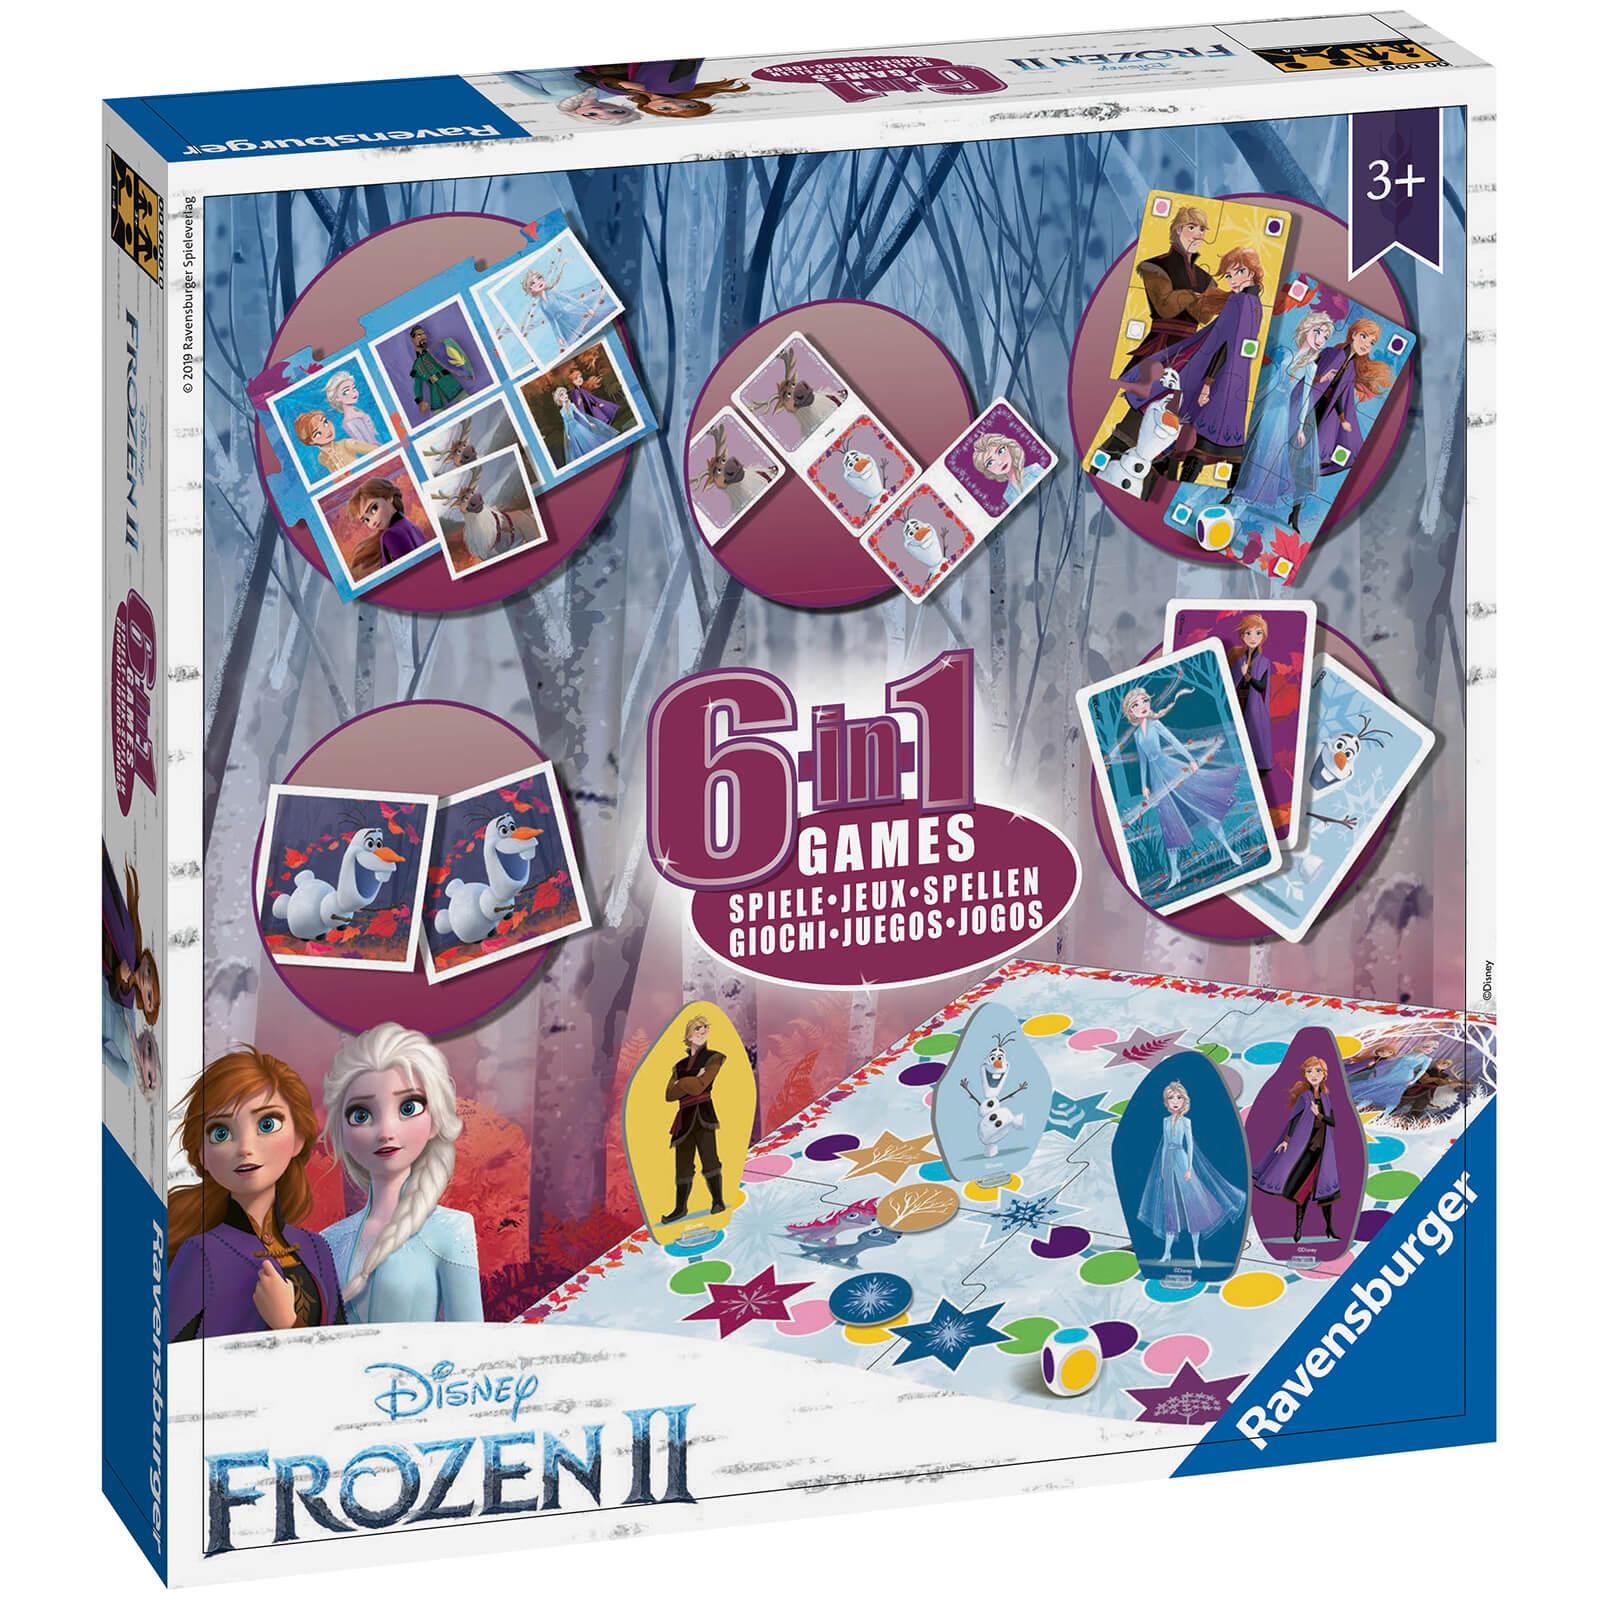 Ravensburger Frozen 2 – 6 in 1 Games Box